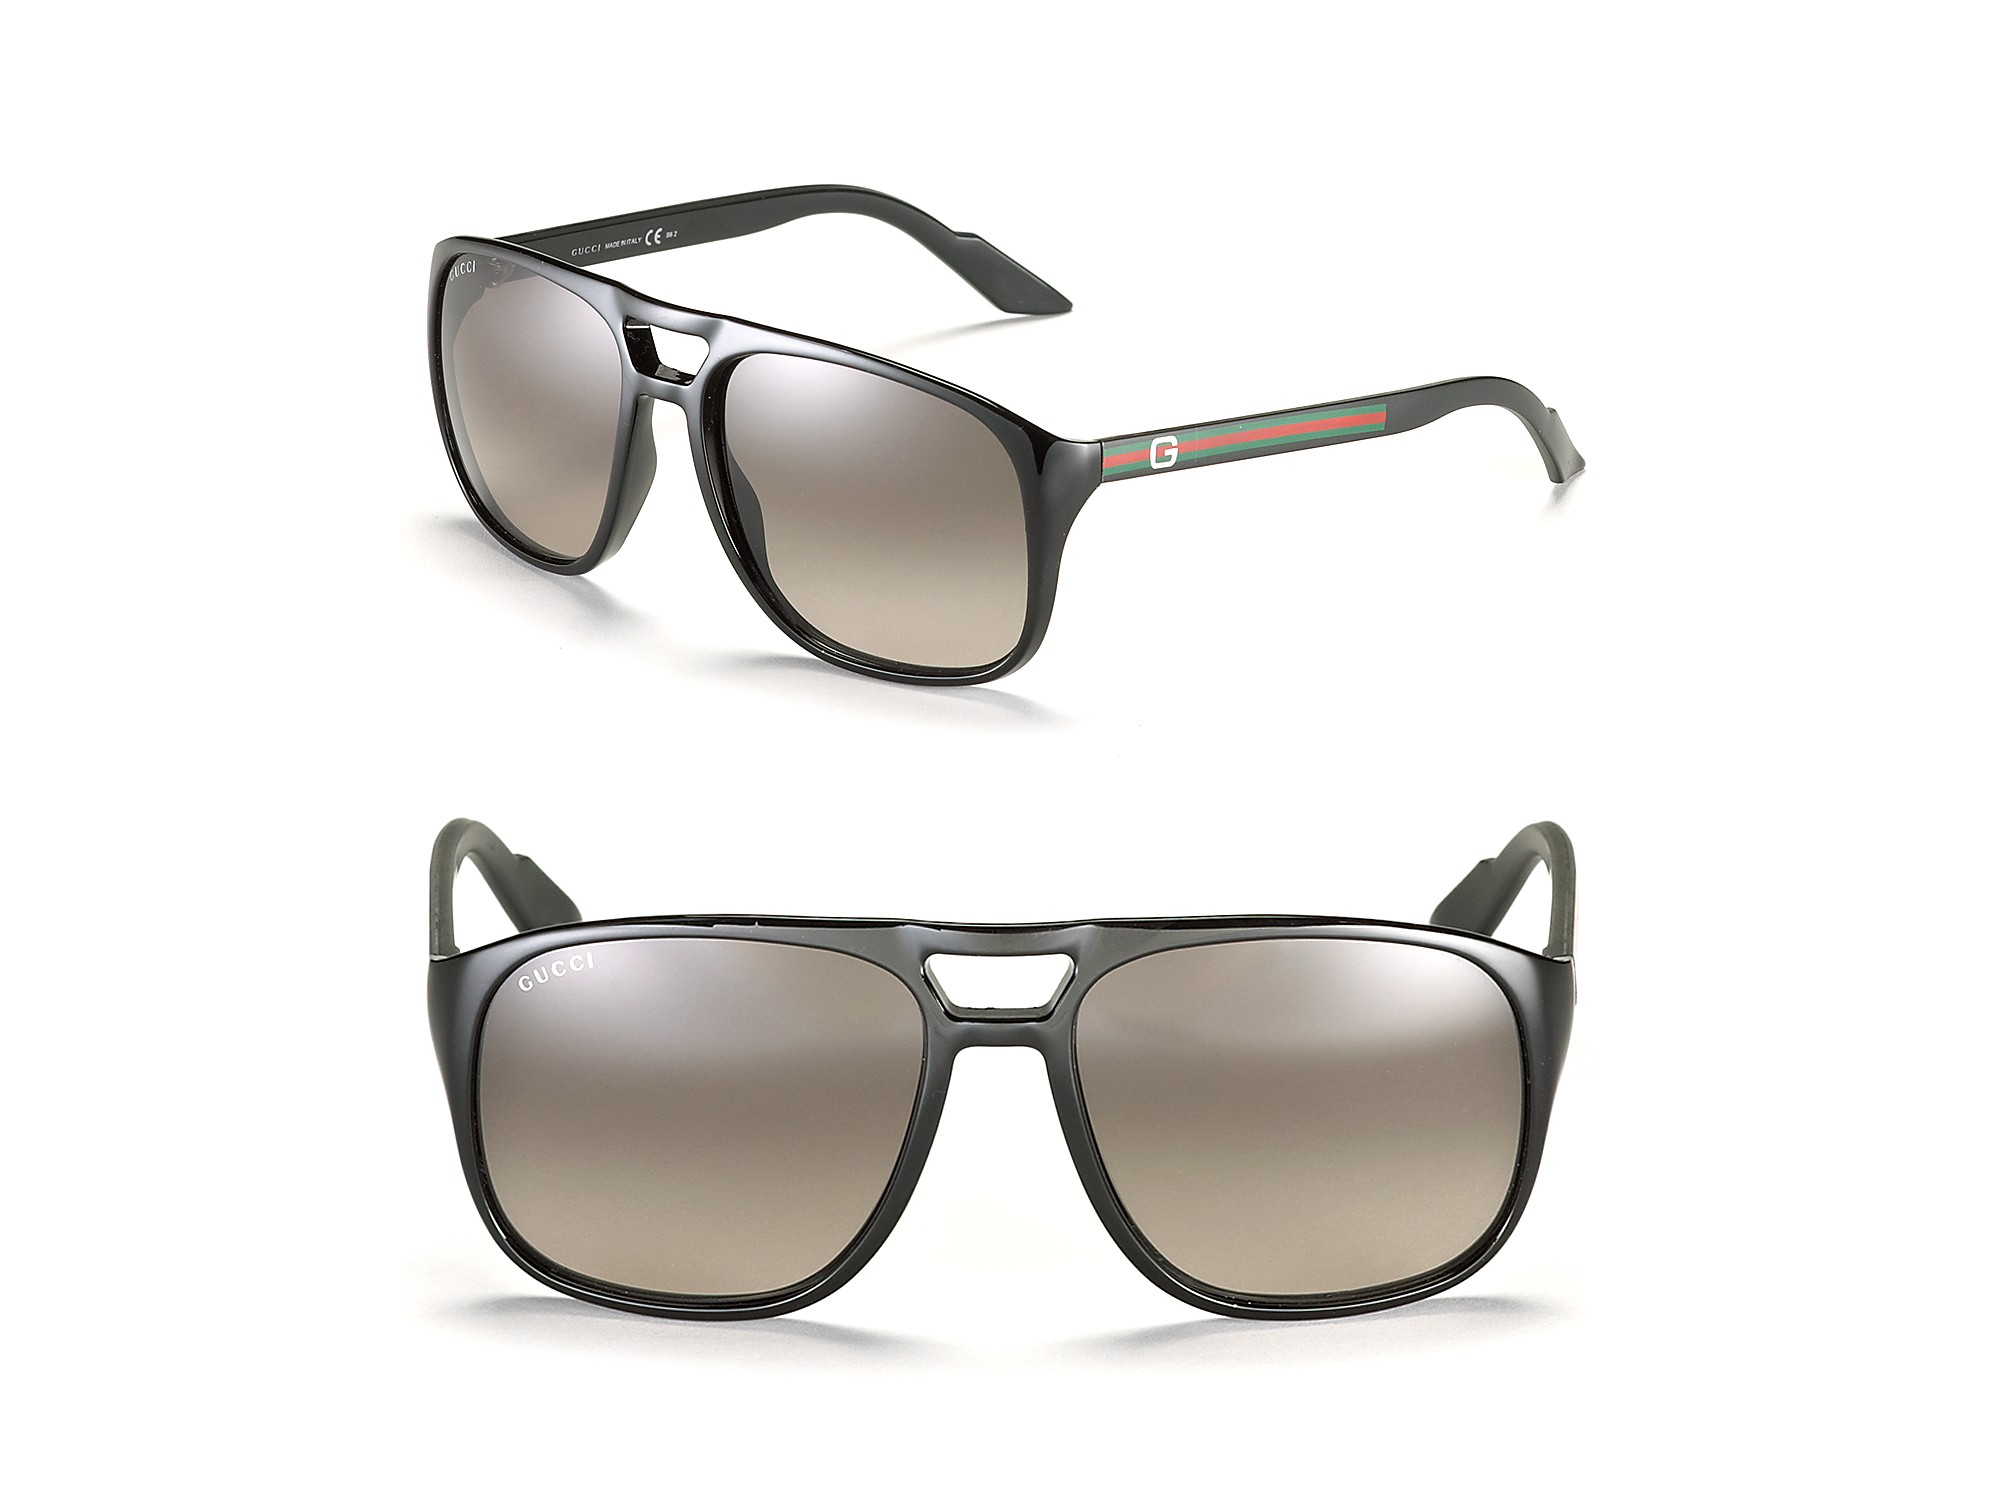 e5a722ce408 Burberry Double Bridge Aviator Sunglasses